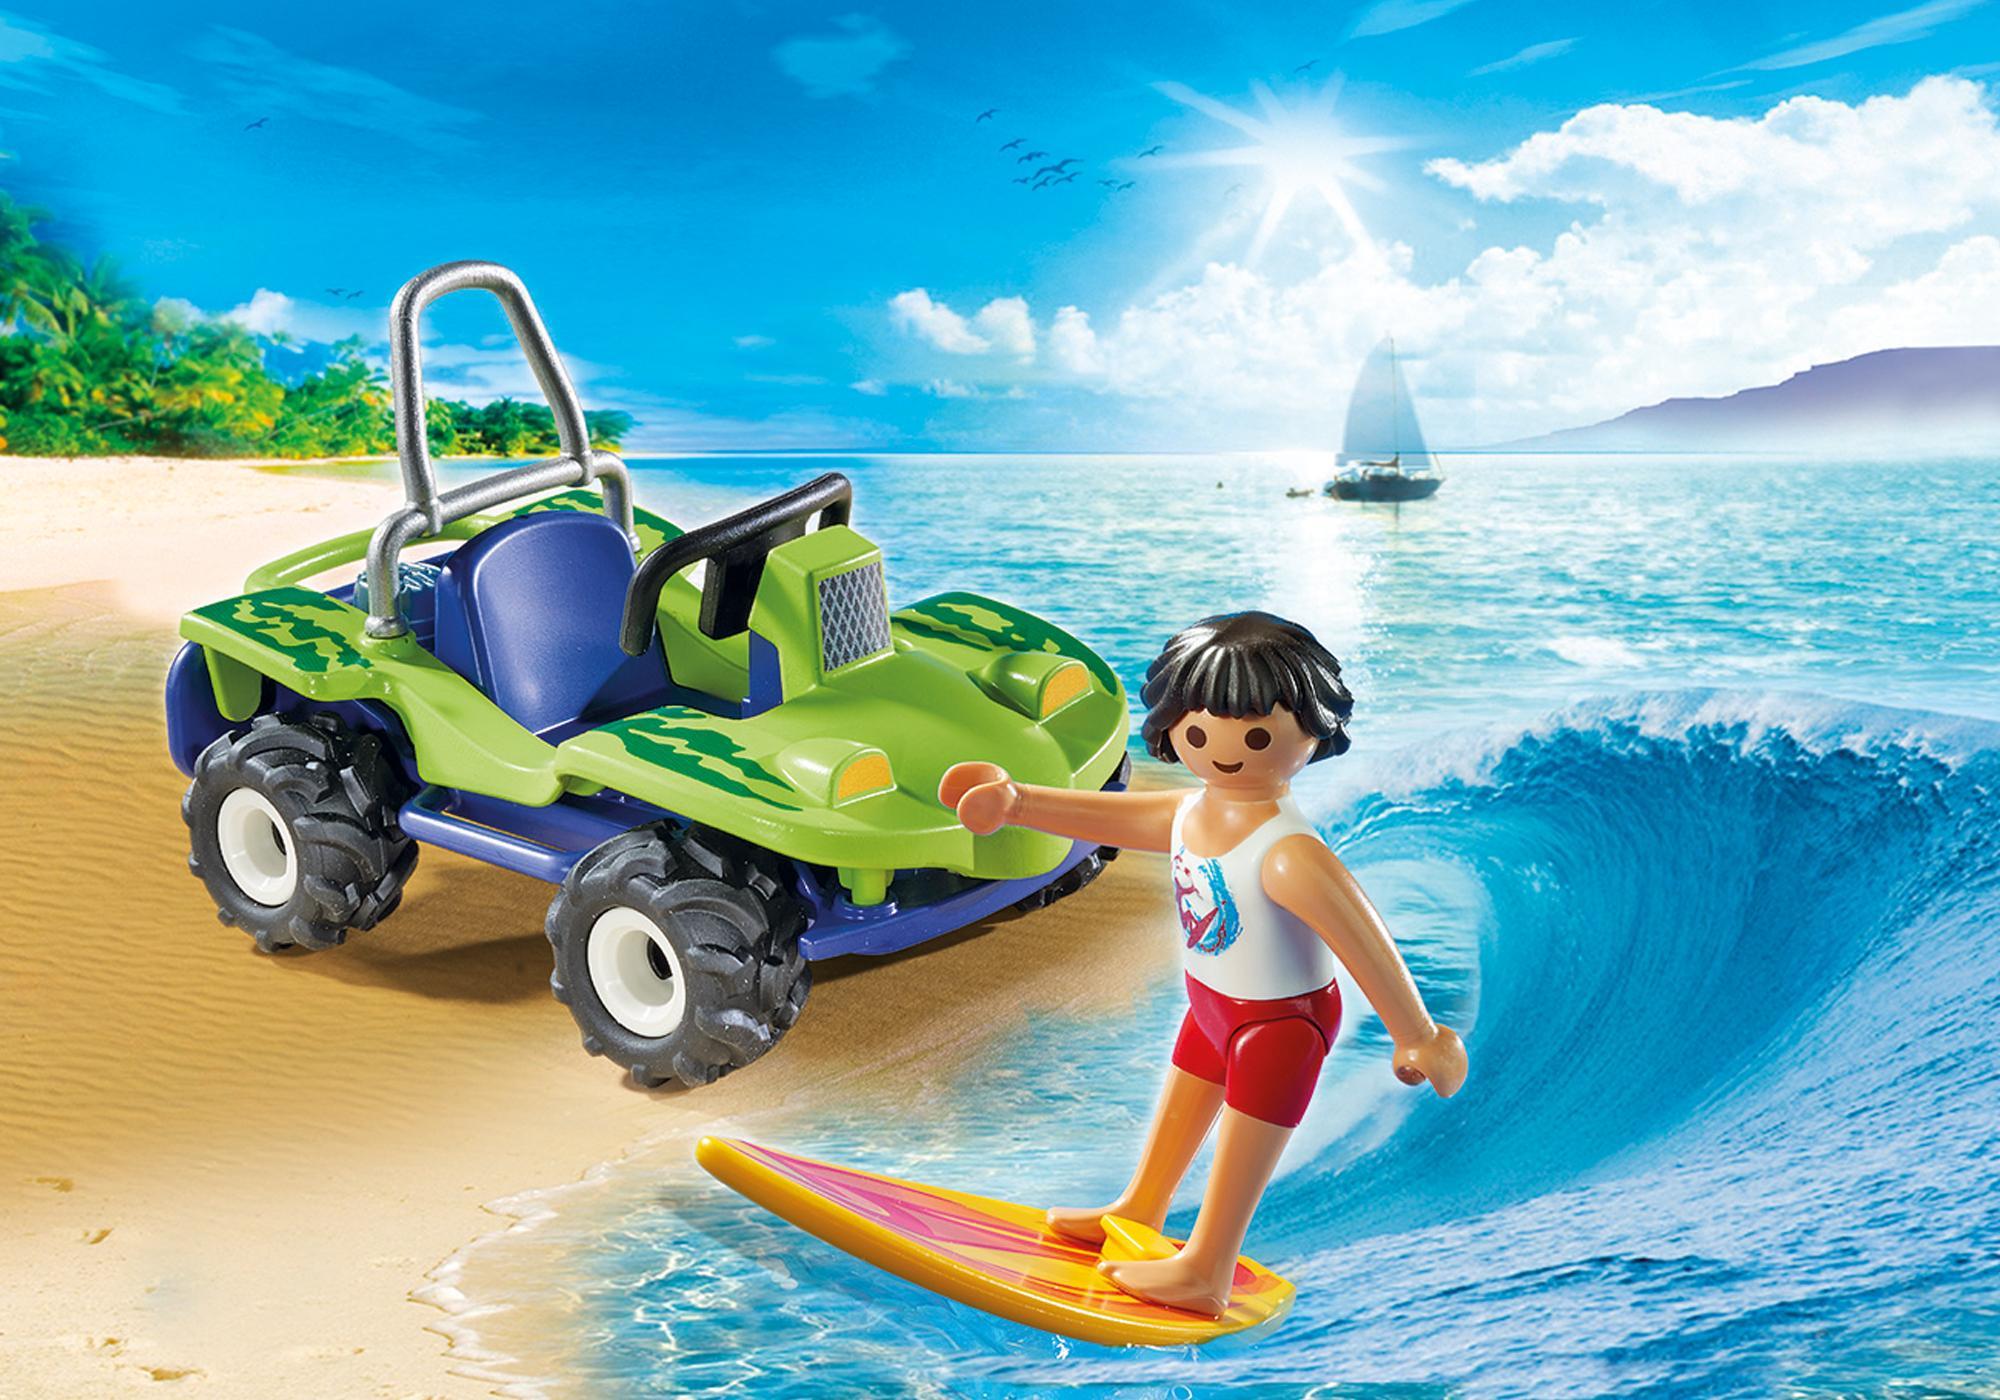 http://media.playmobil.com/i/playmobil/6982_product_detail